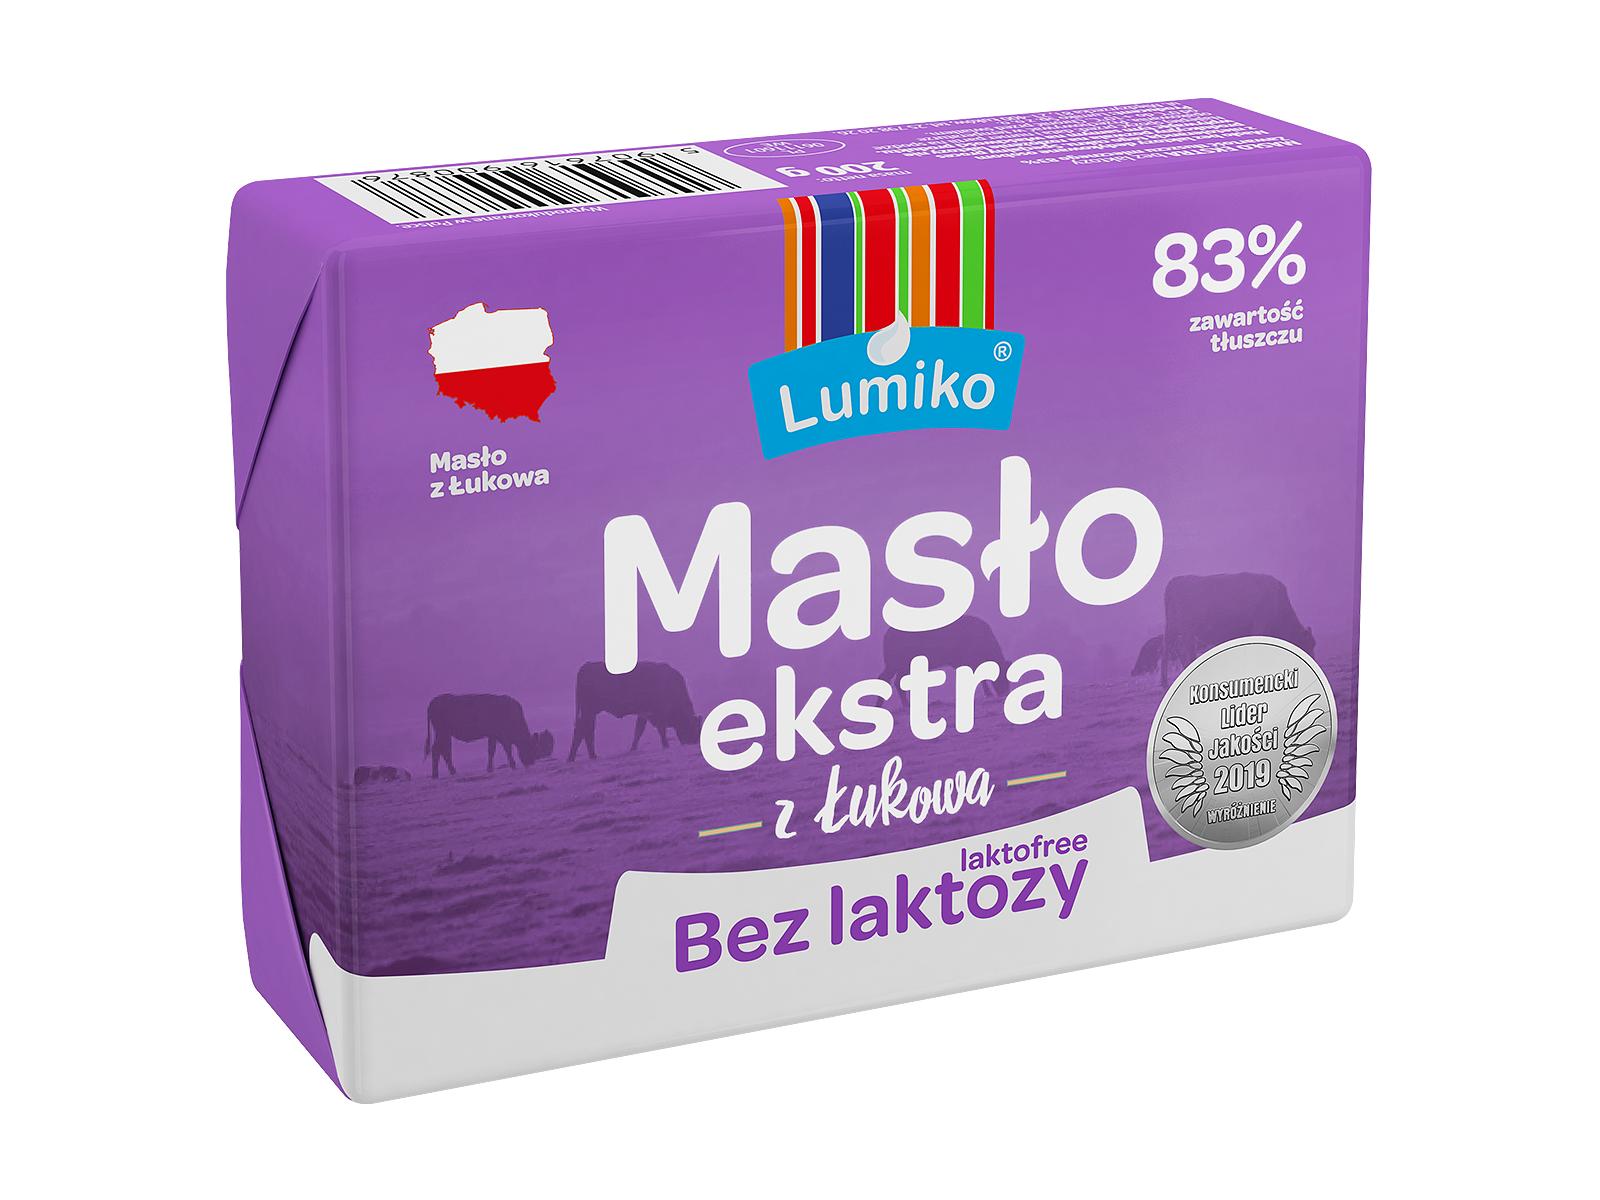 LUMIKO_maslo2_bez_laktozy